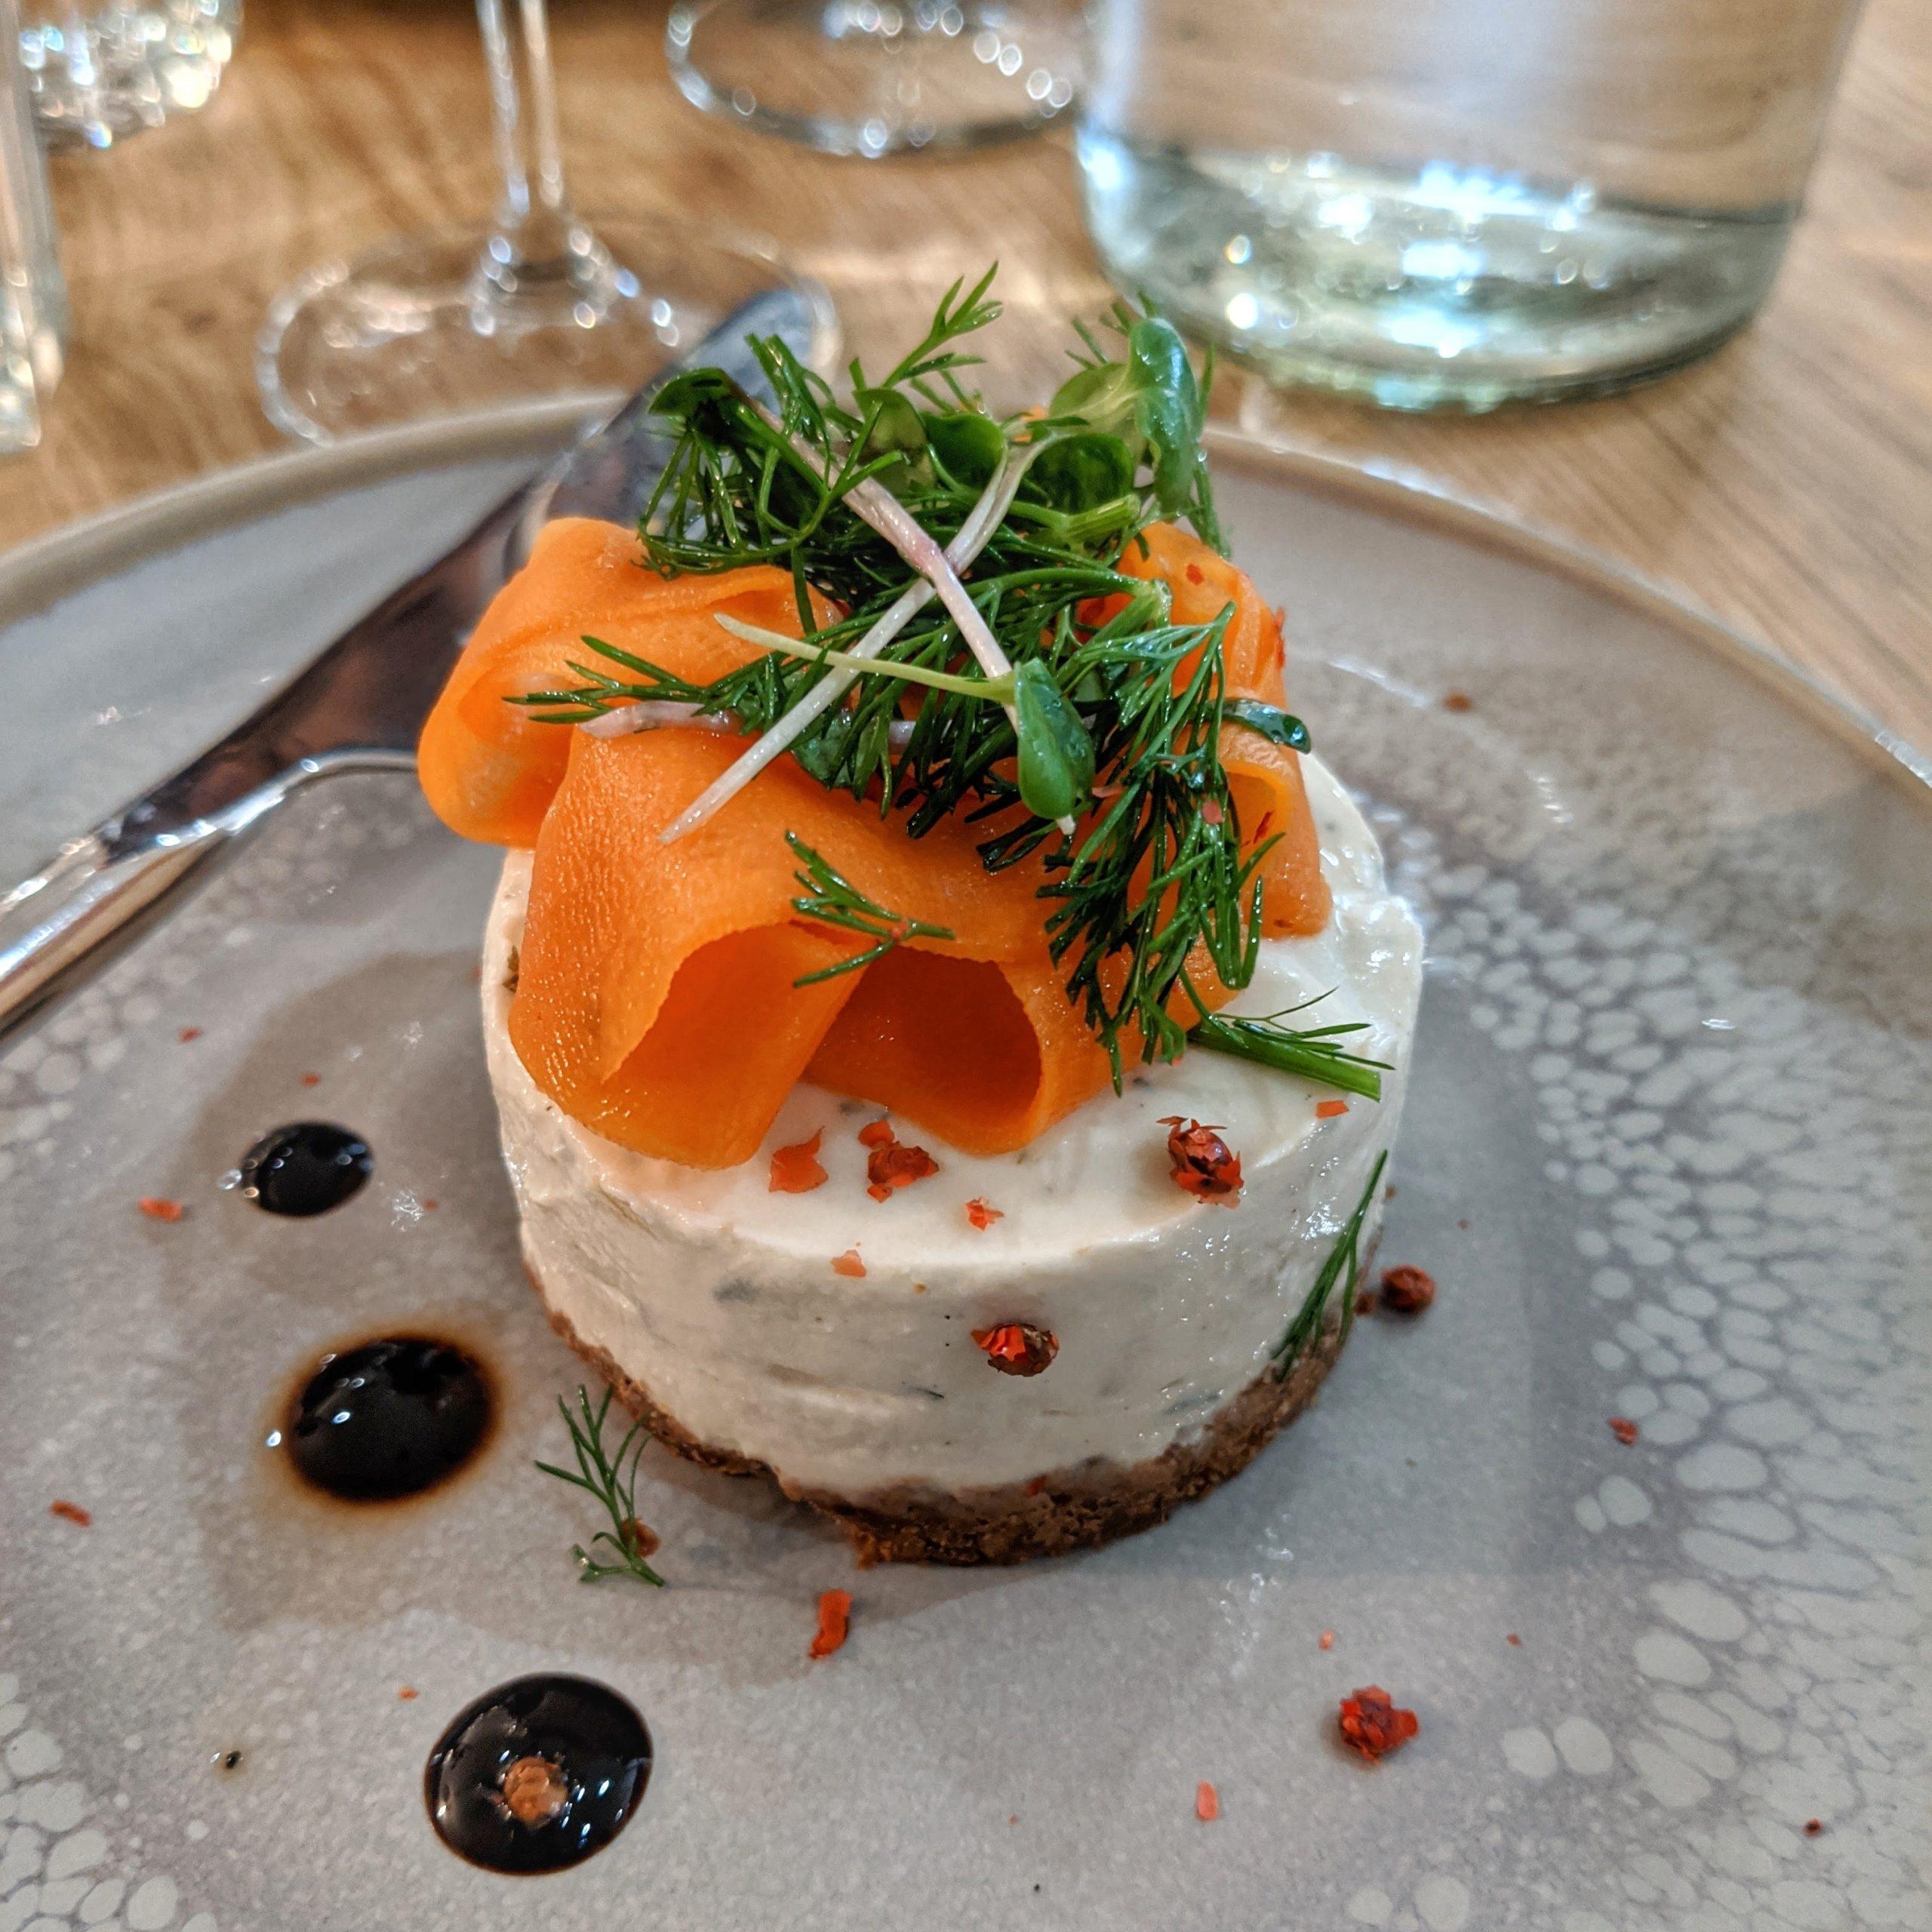 savory cheesecake vegan gluten free Paris ©2020 Octavio Fuentes